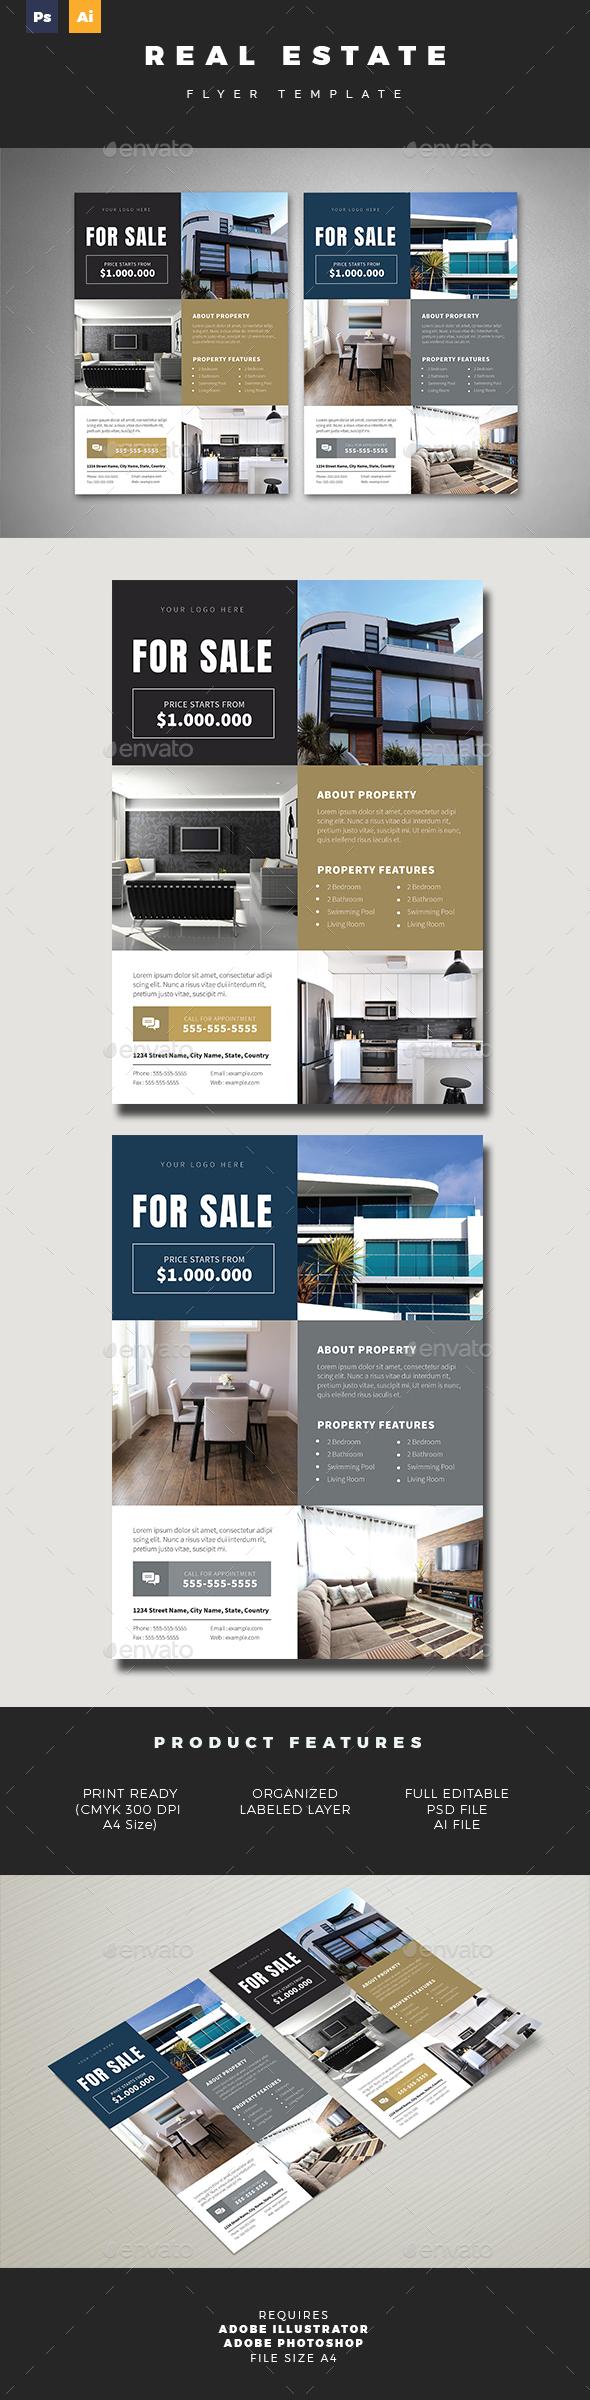 Real Estate Flyer 03 - Commerce Flyers